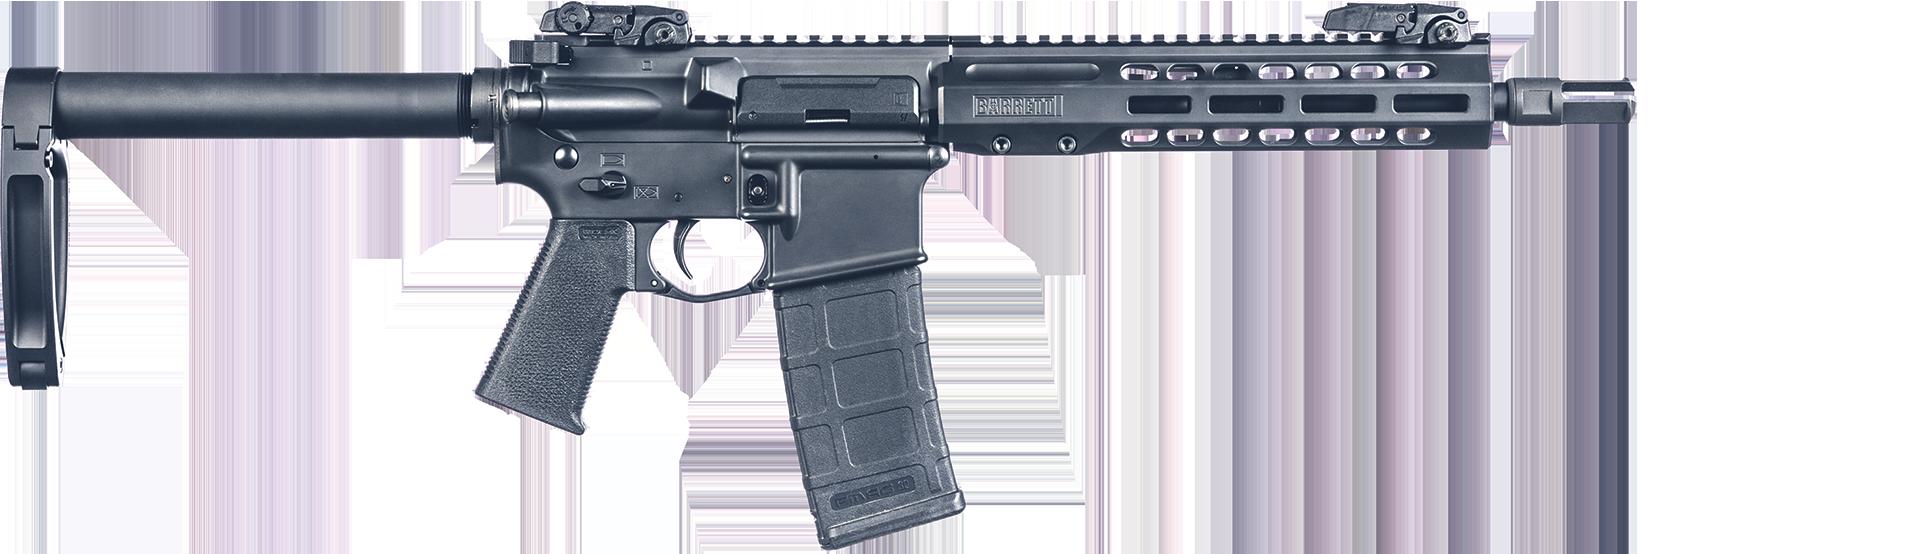 "pistol"" Barrel Configuration Image"